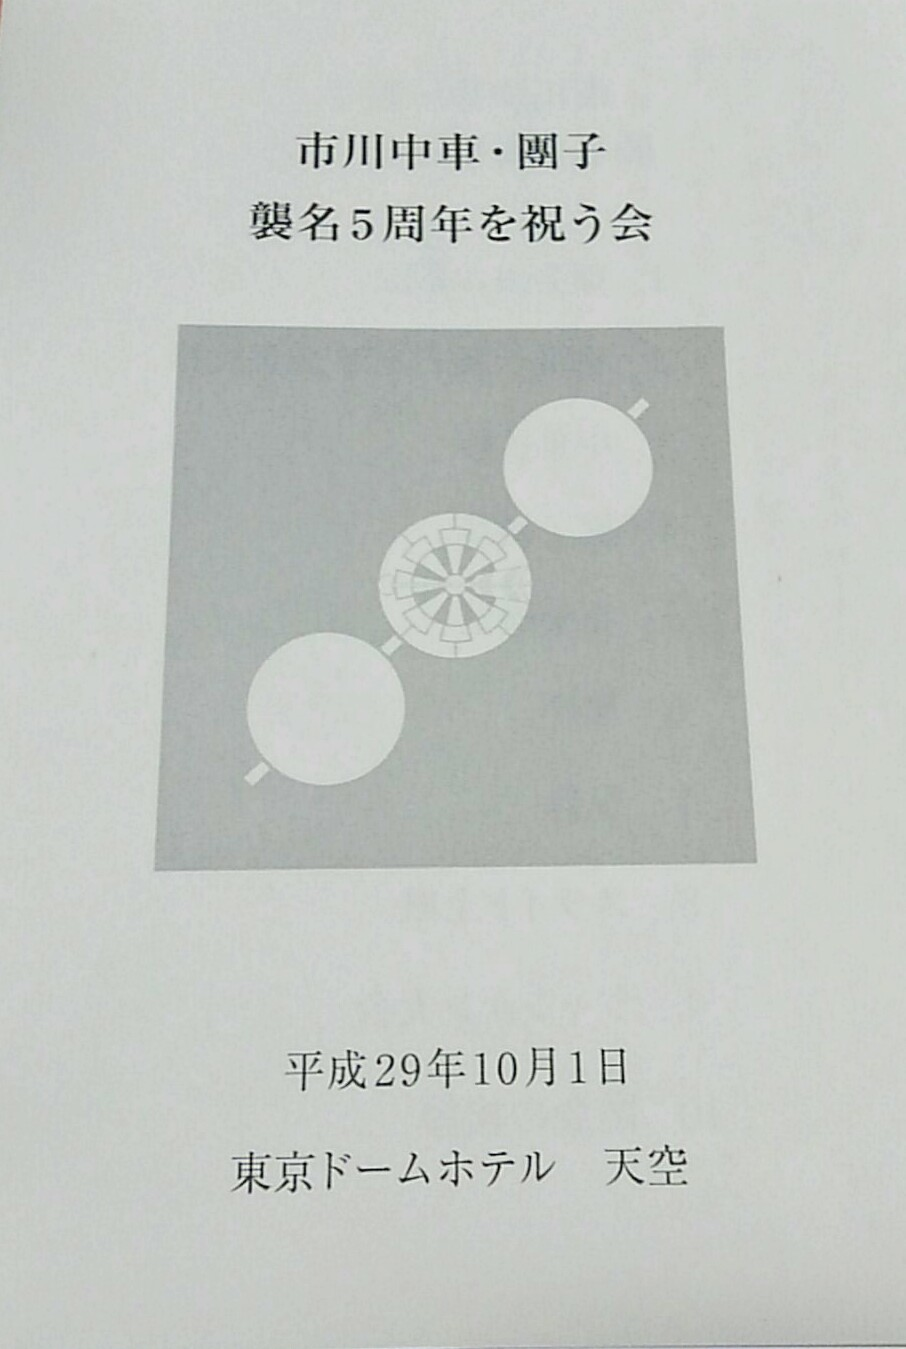 c0357659_17355726.jpg